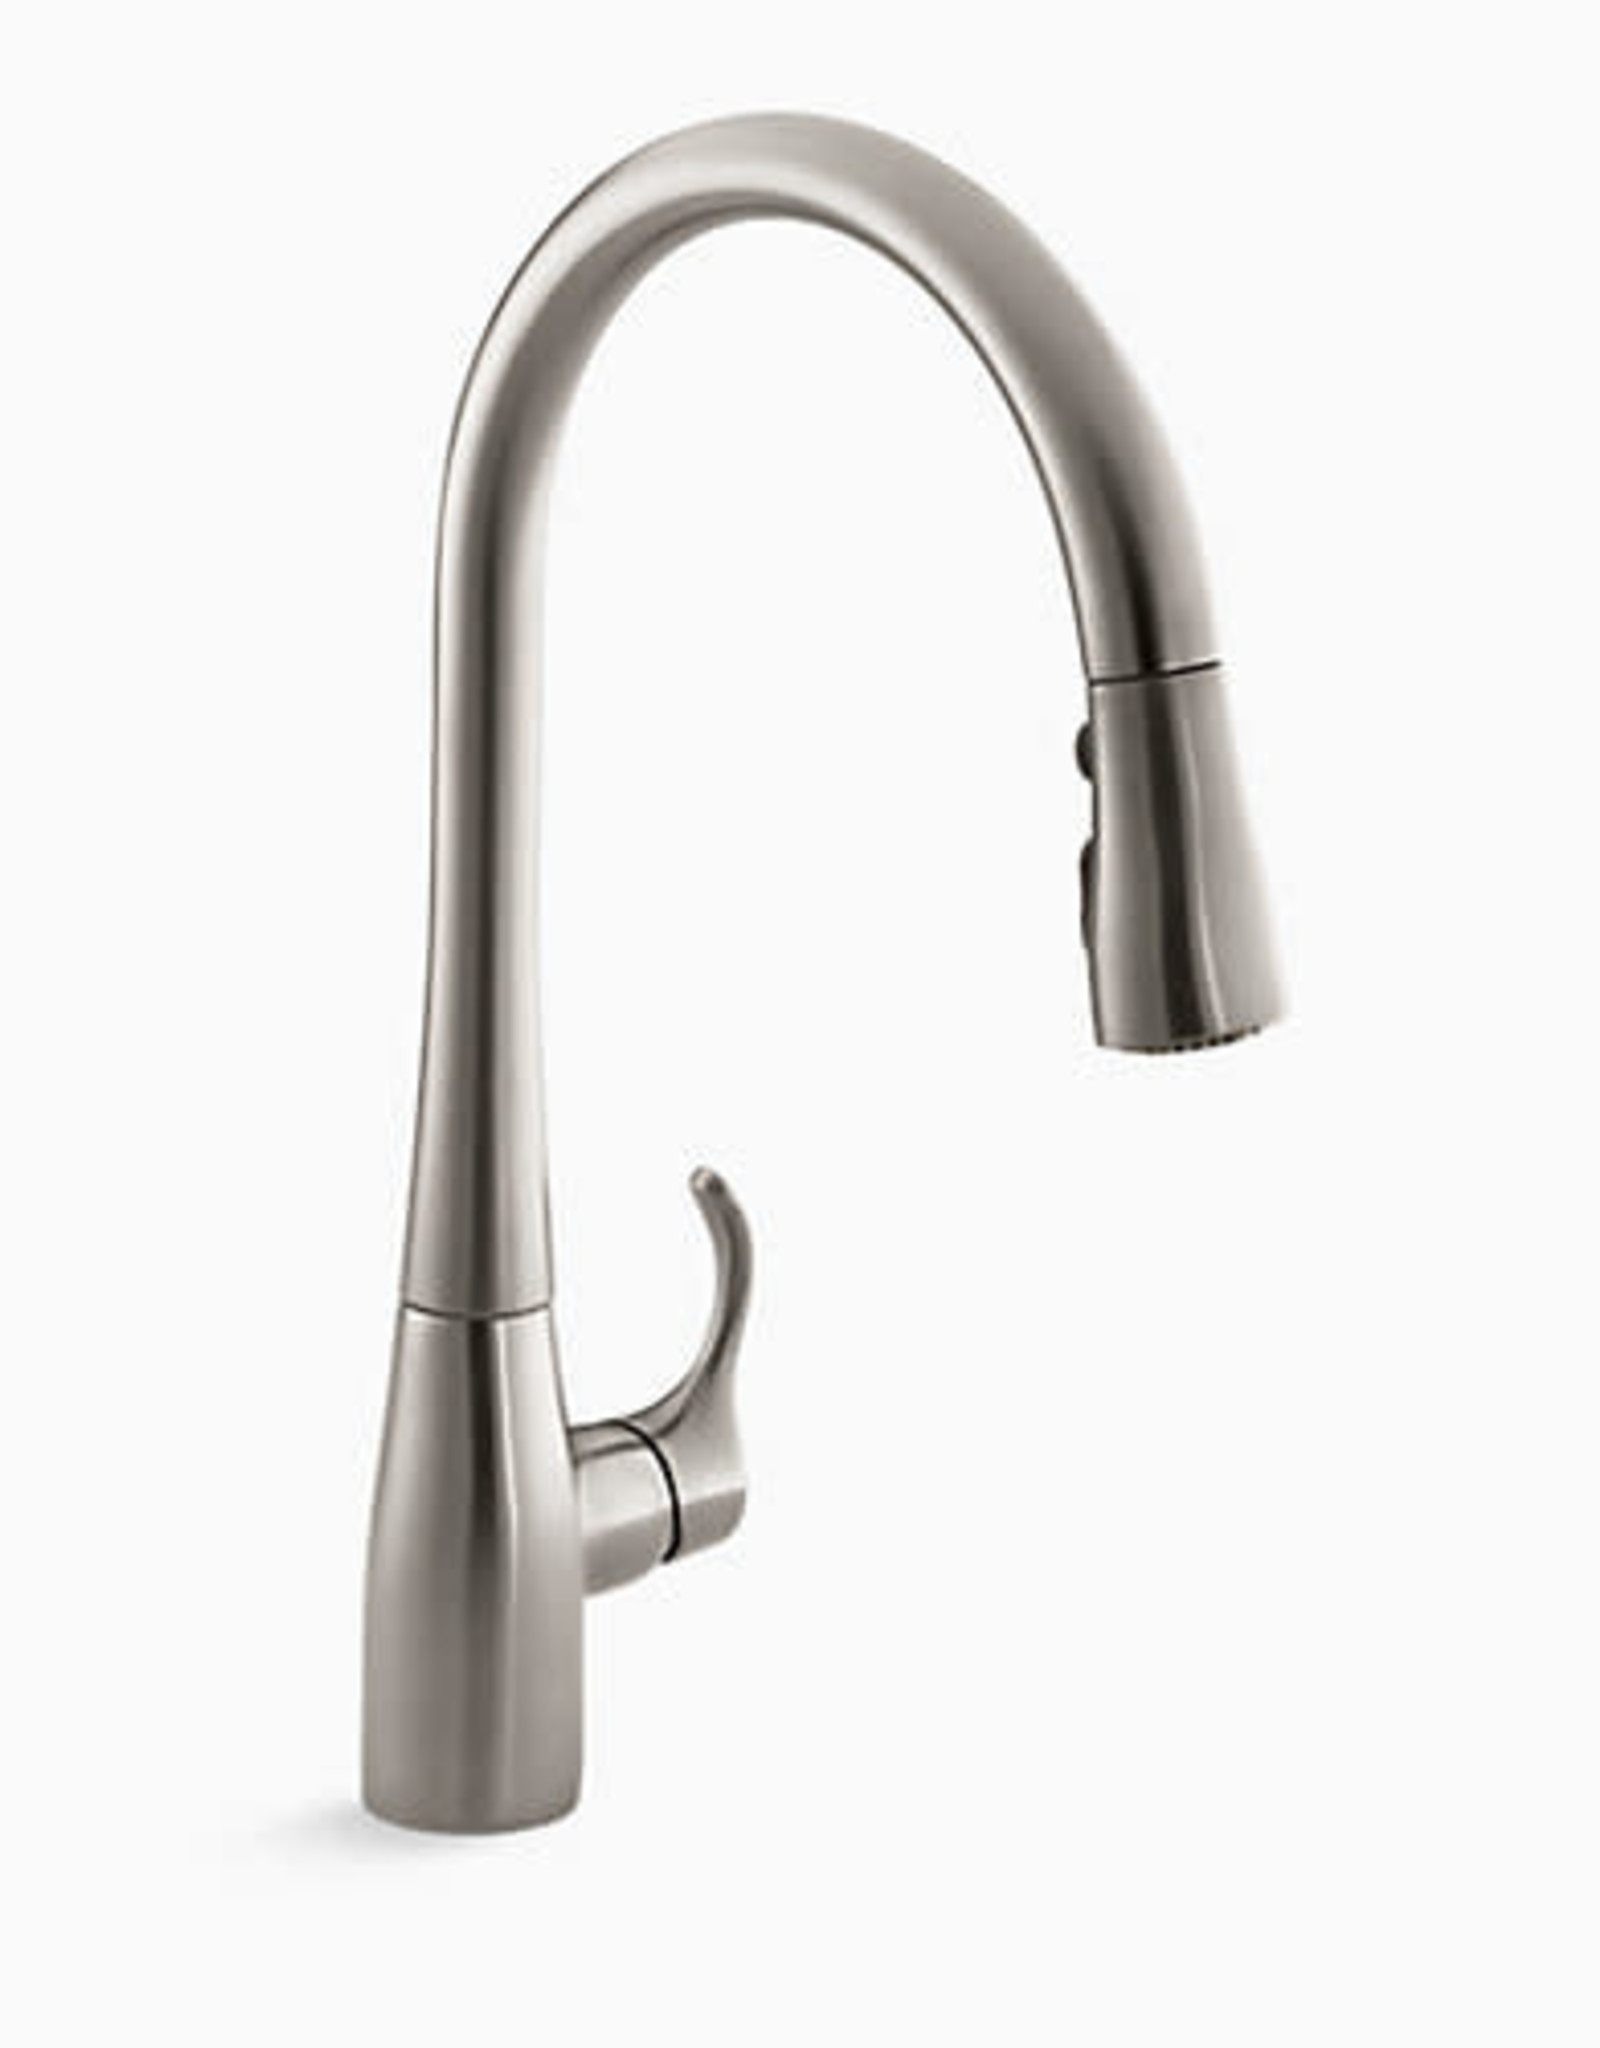 Kohler Kohler Simplice 3-Function Pullout Kitchen Faucet- Stainless